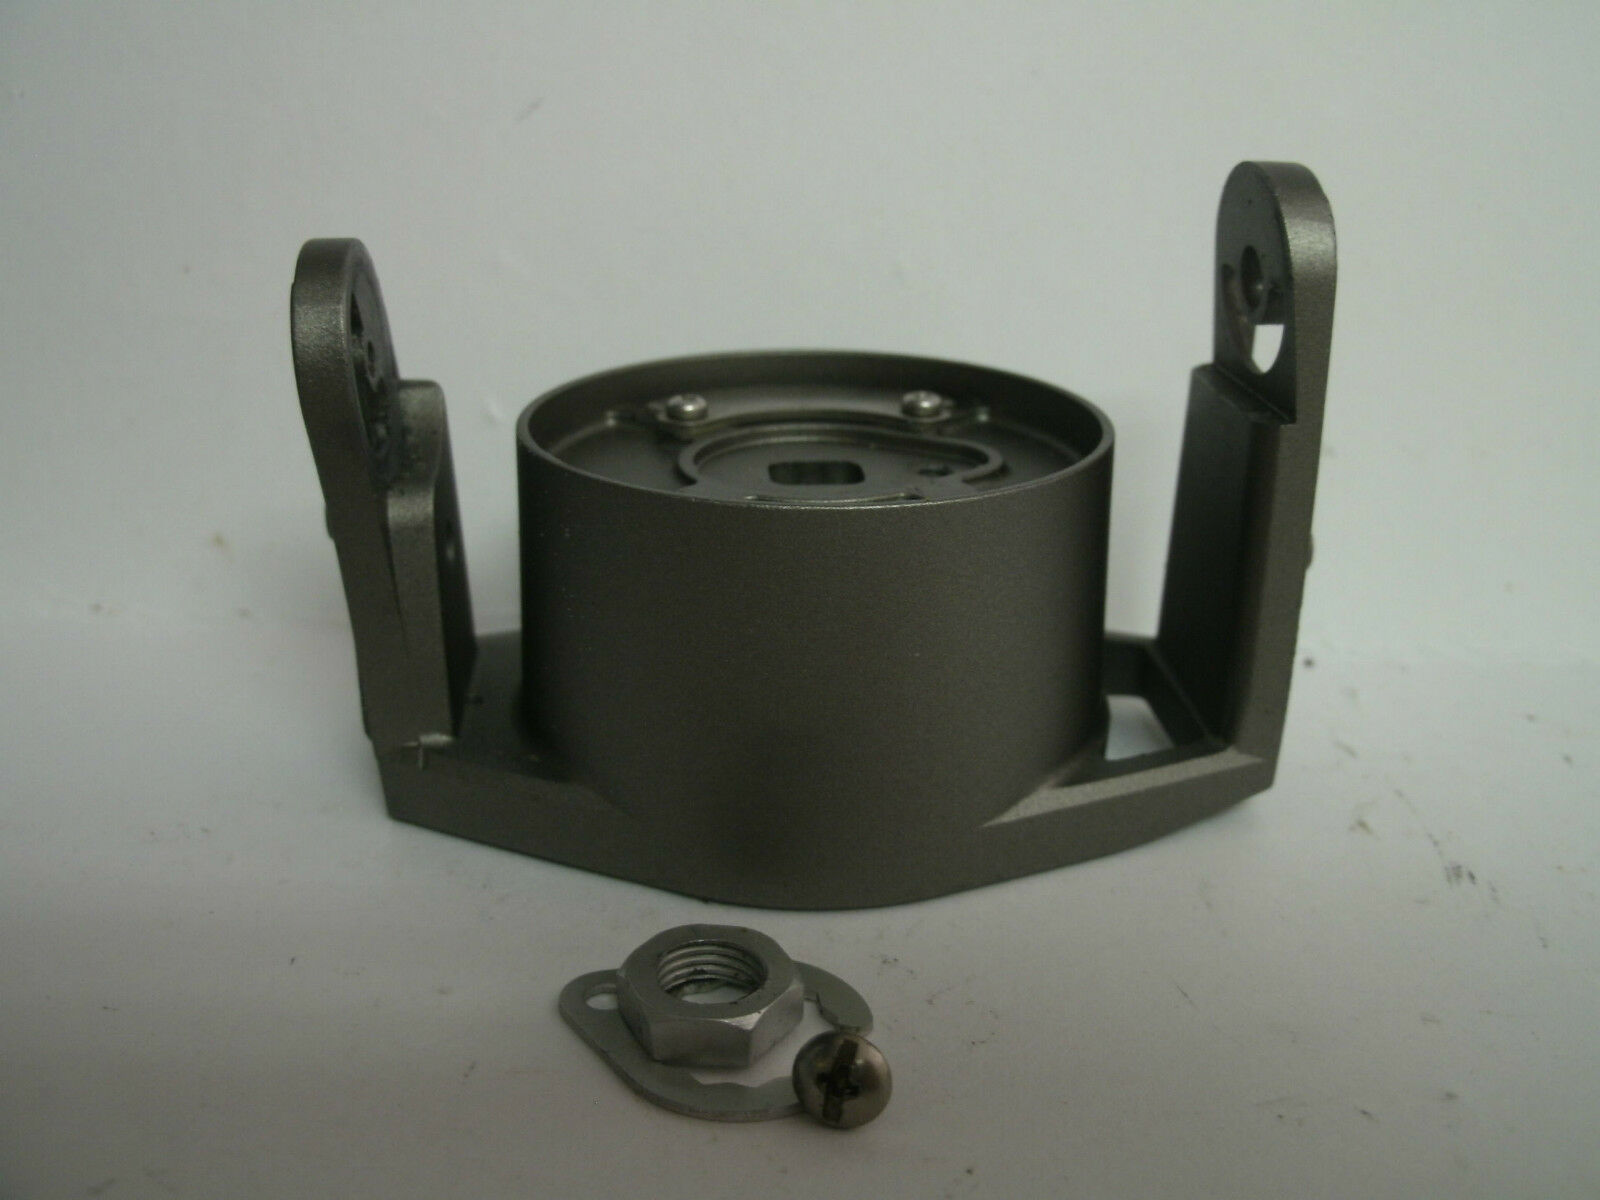 USED SHIMANO REEL PART - Stella 4000F Spinning Reel - redor